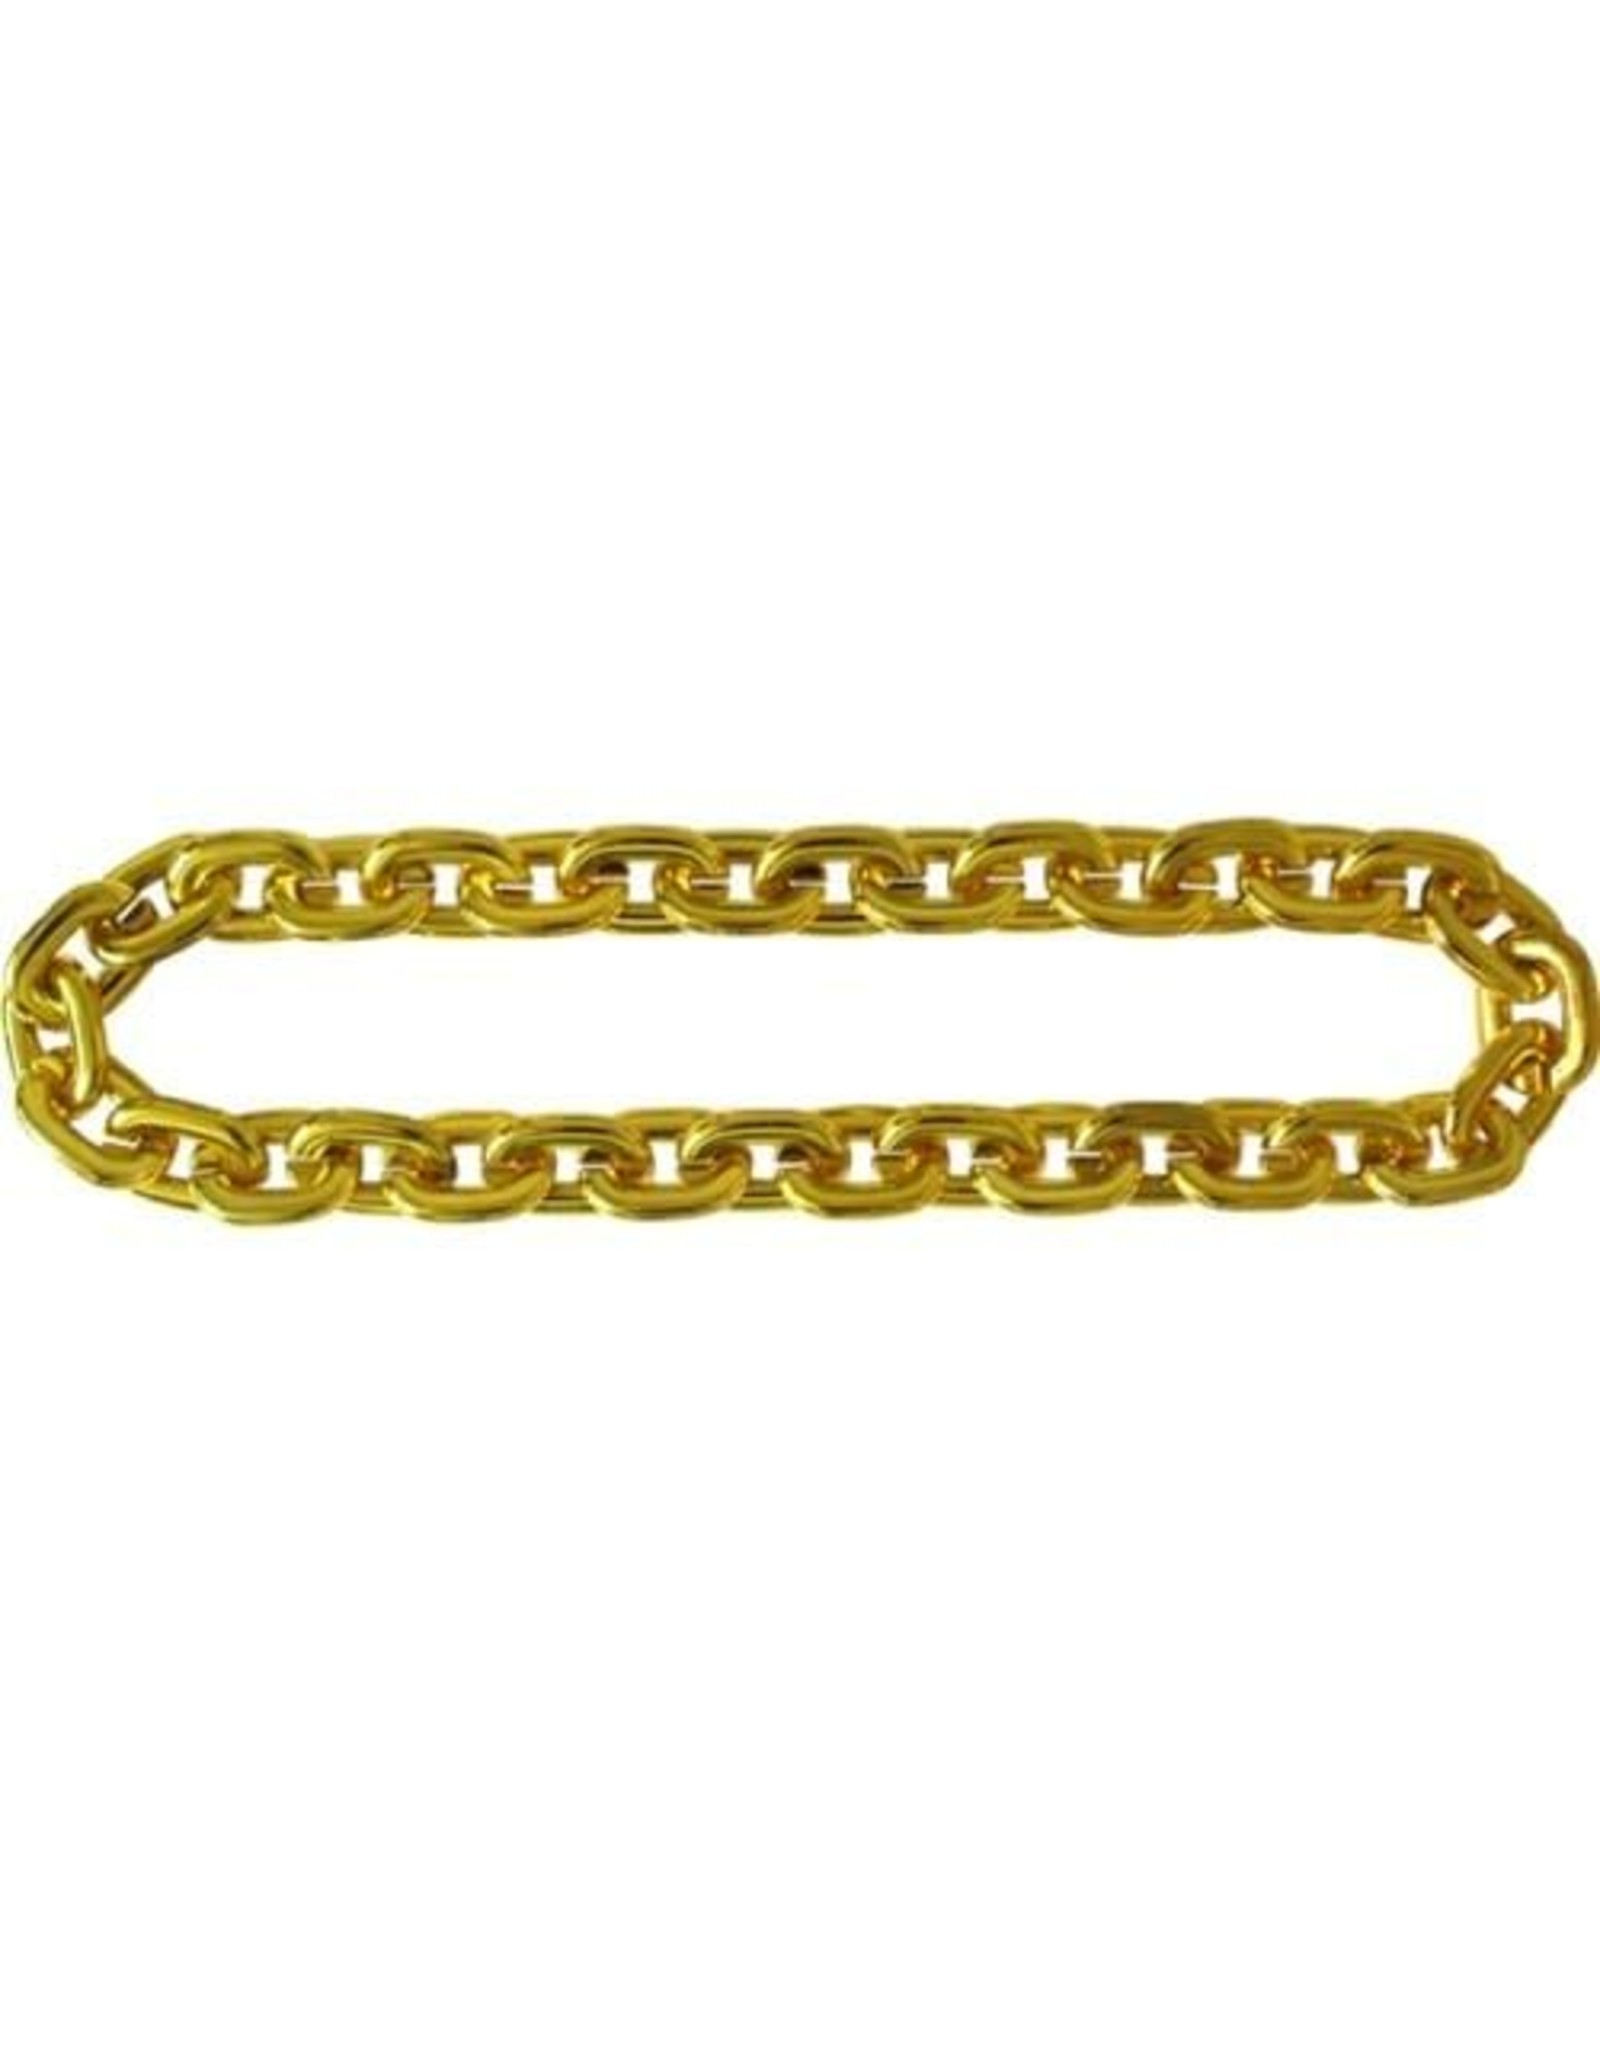 Dillon Jumbo Gold Chain